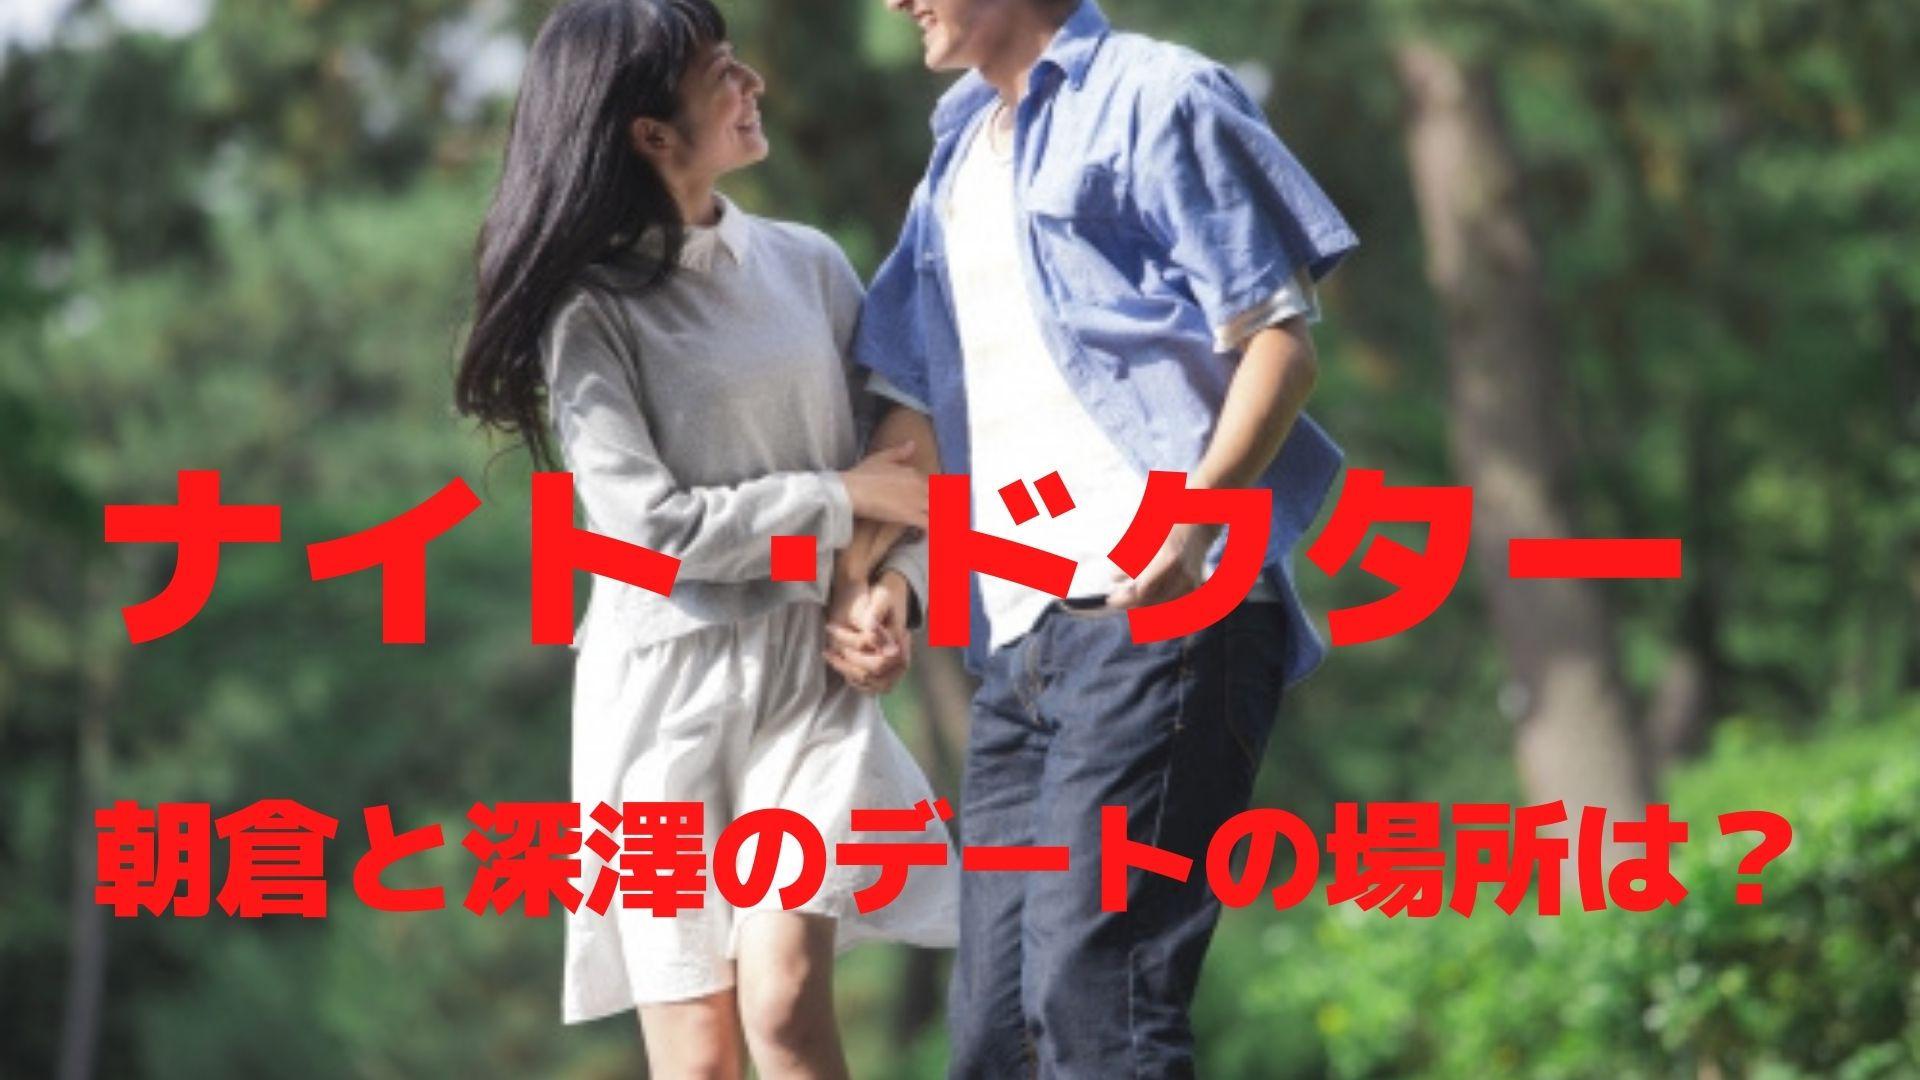 night-doctor-asakura-fukasawa-date